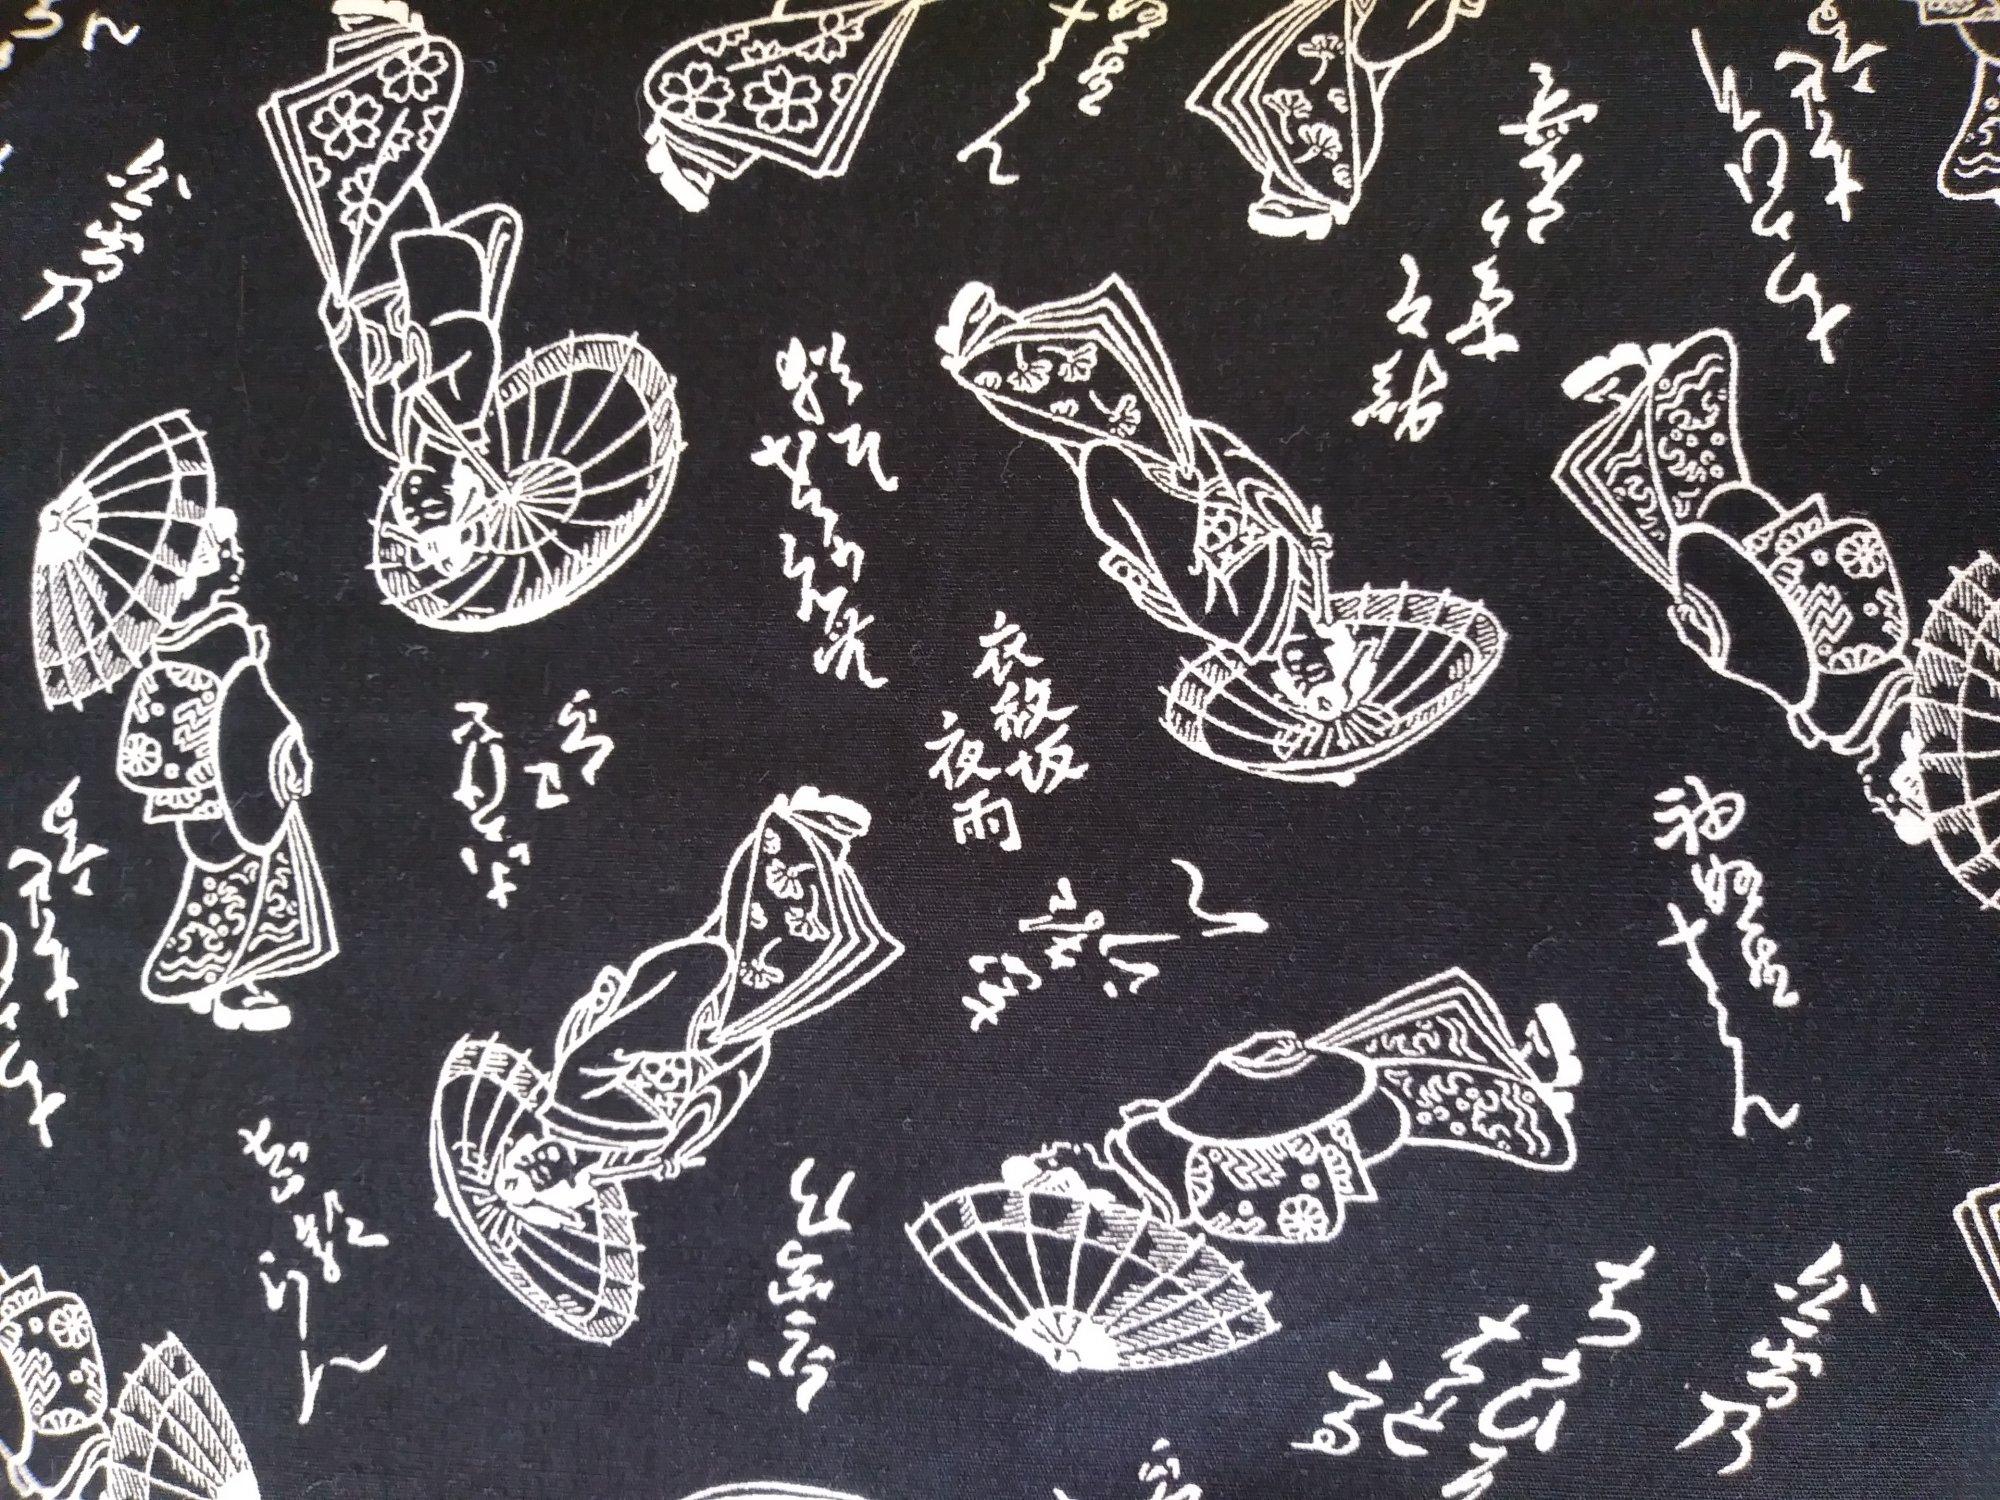 Kona Bay Fabrics Indigo Collection Black